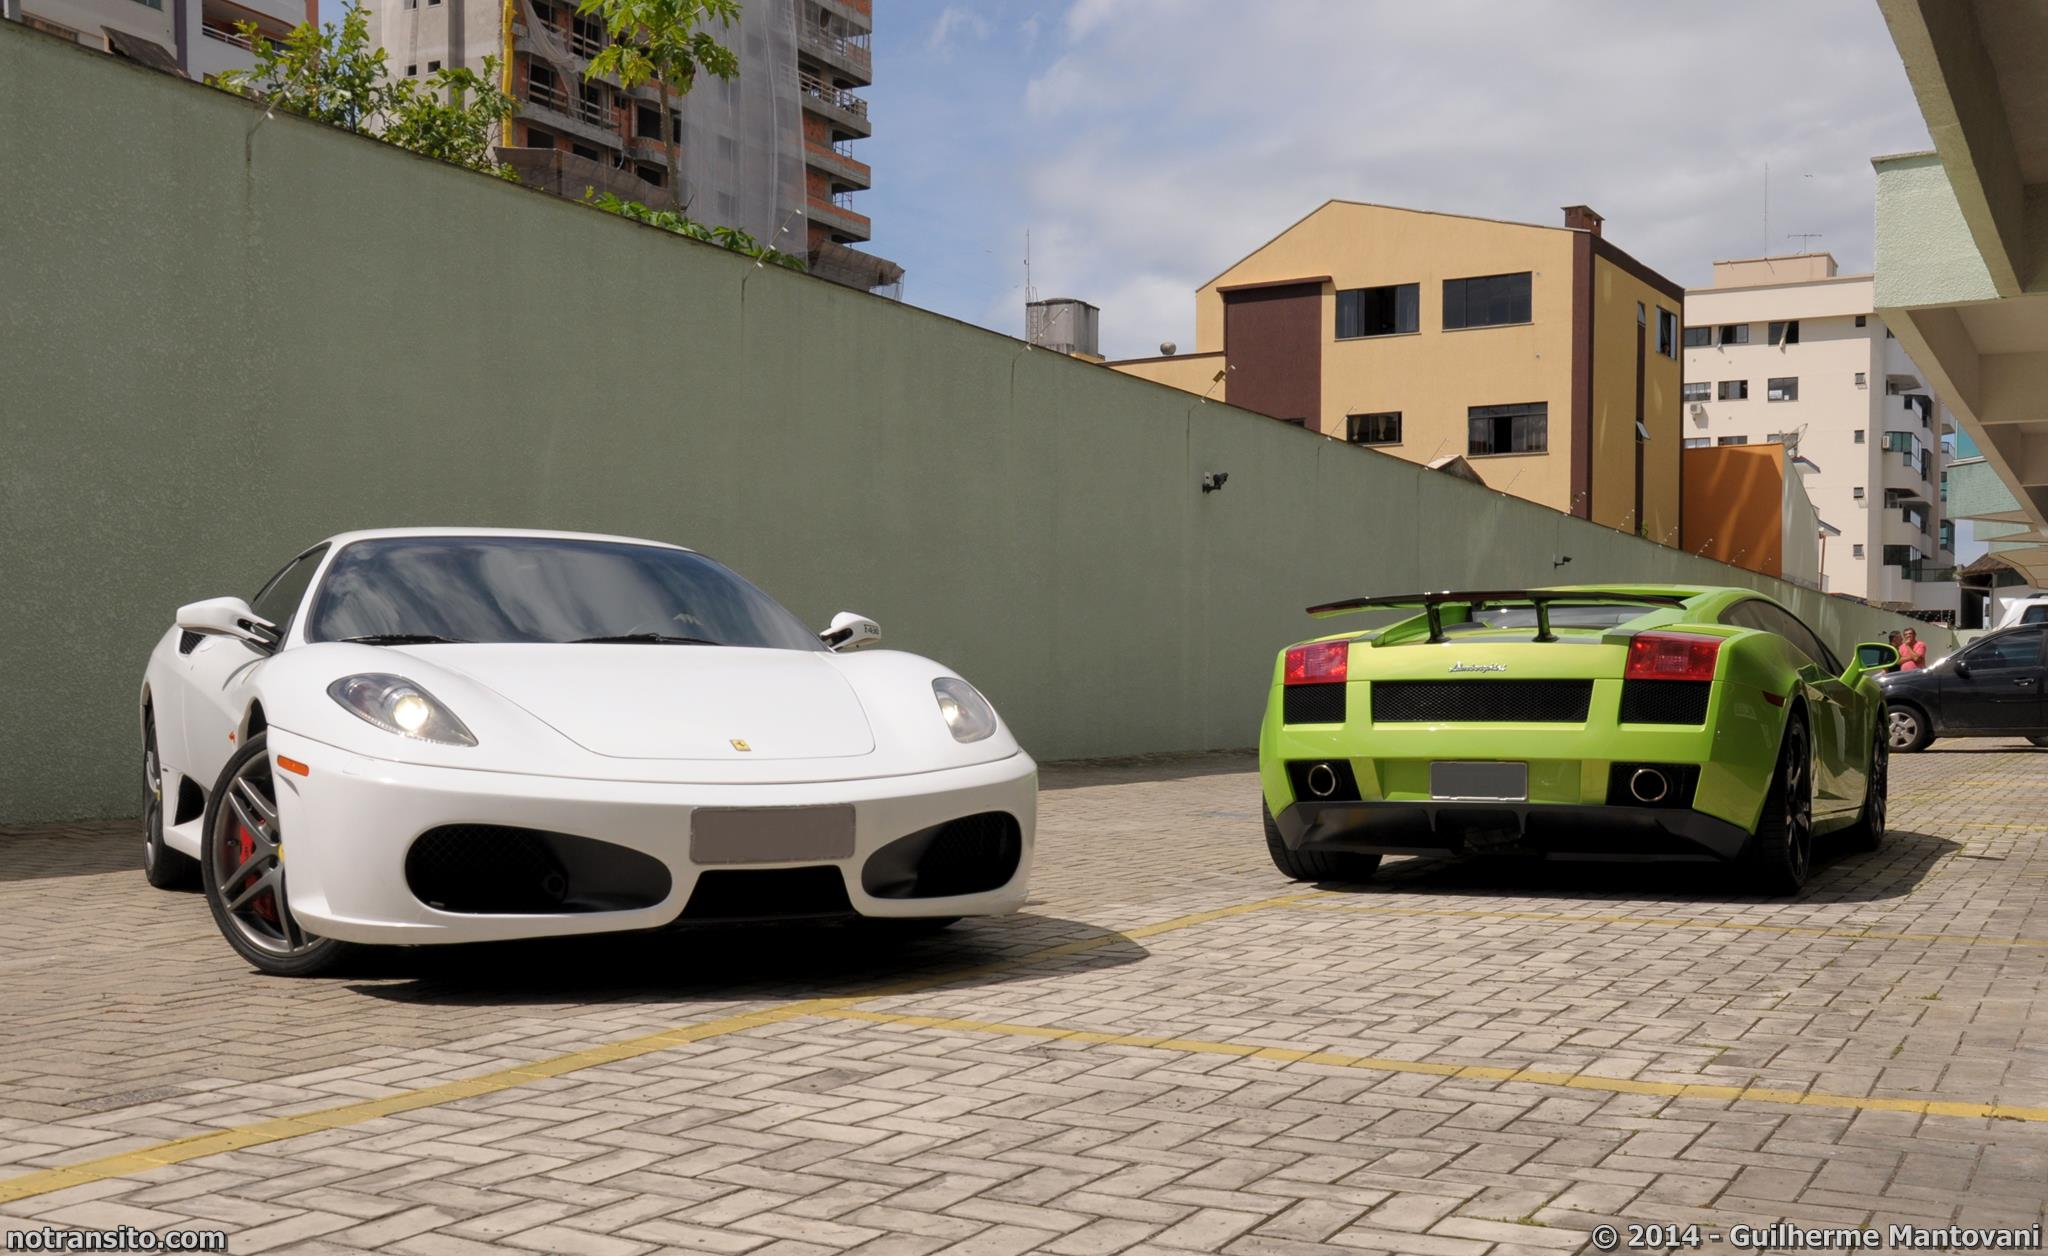 Ferrari F430 Coupe White, Lamborghini Gallardo Verde Ithaca, Meia Praia Itapema